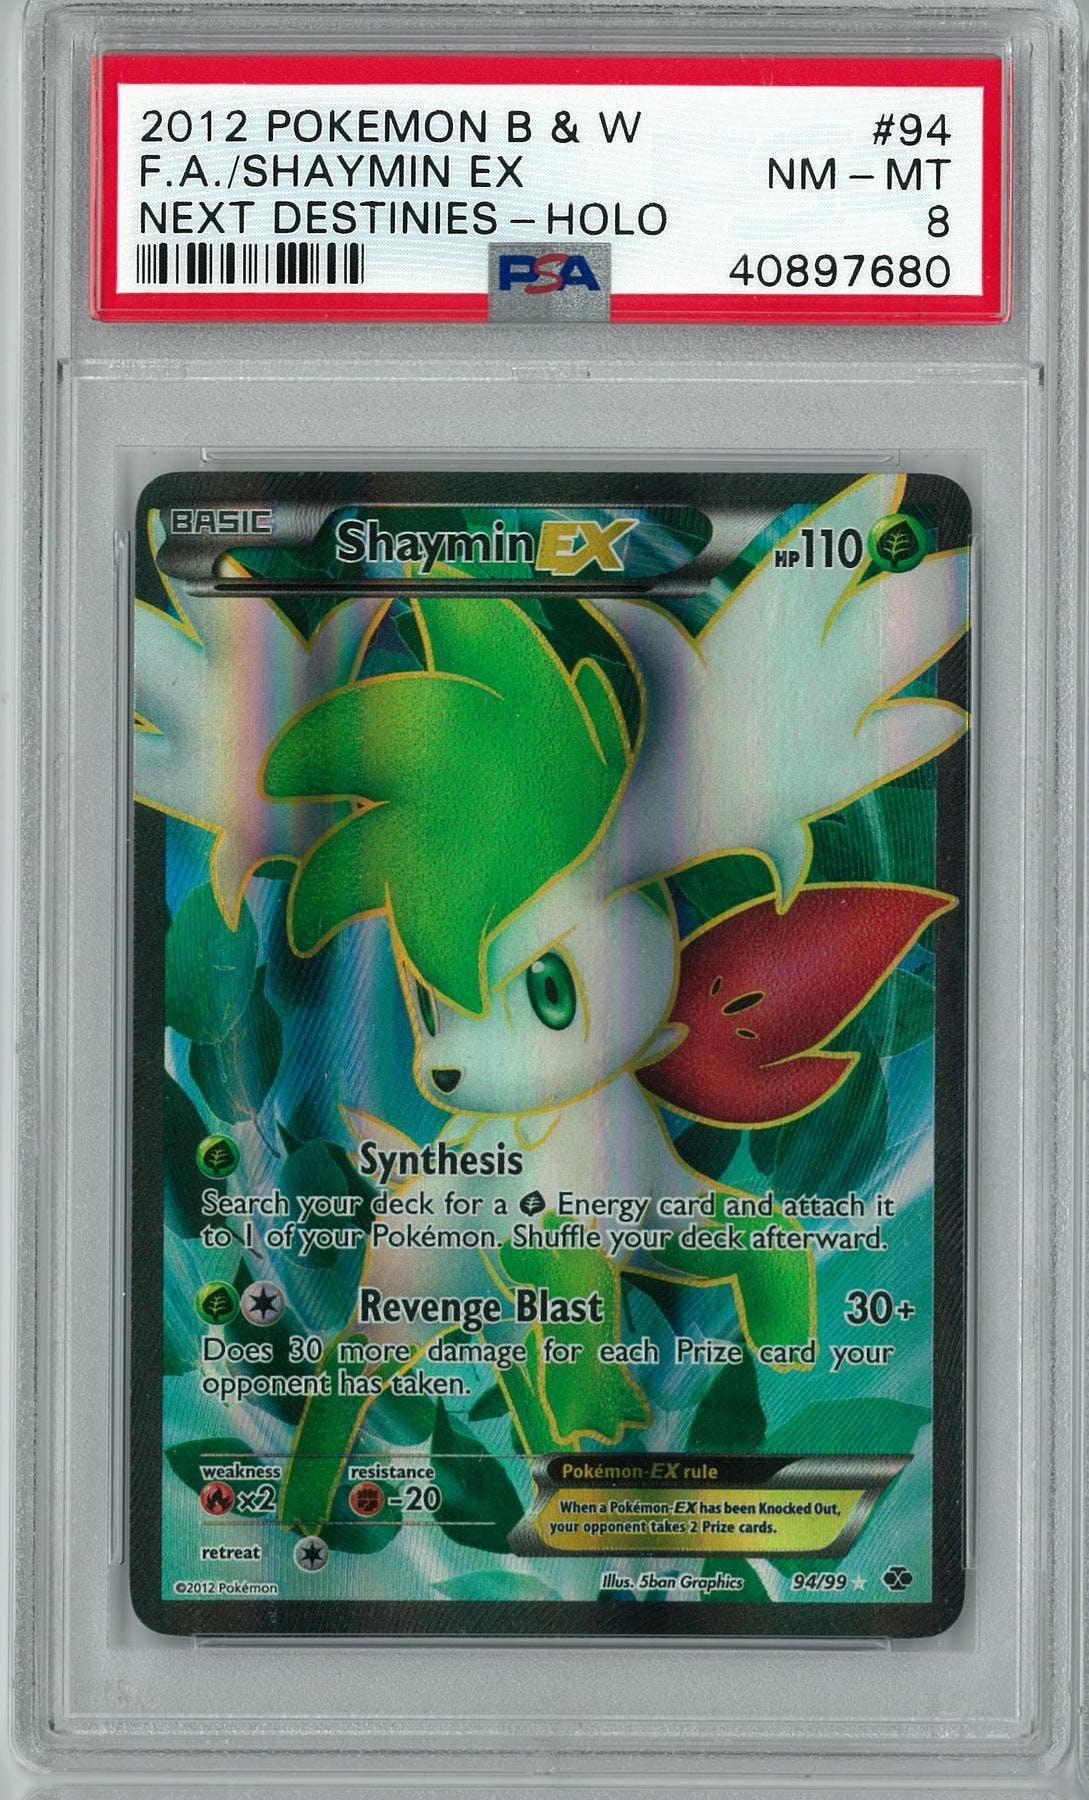 Pokemon Bw Next Destinies Shaymin Ex 9499 Psa 8 Da Card World